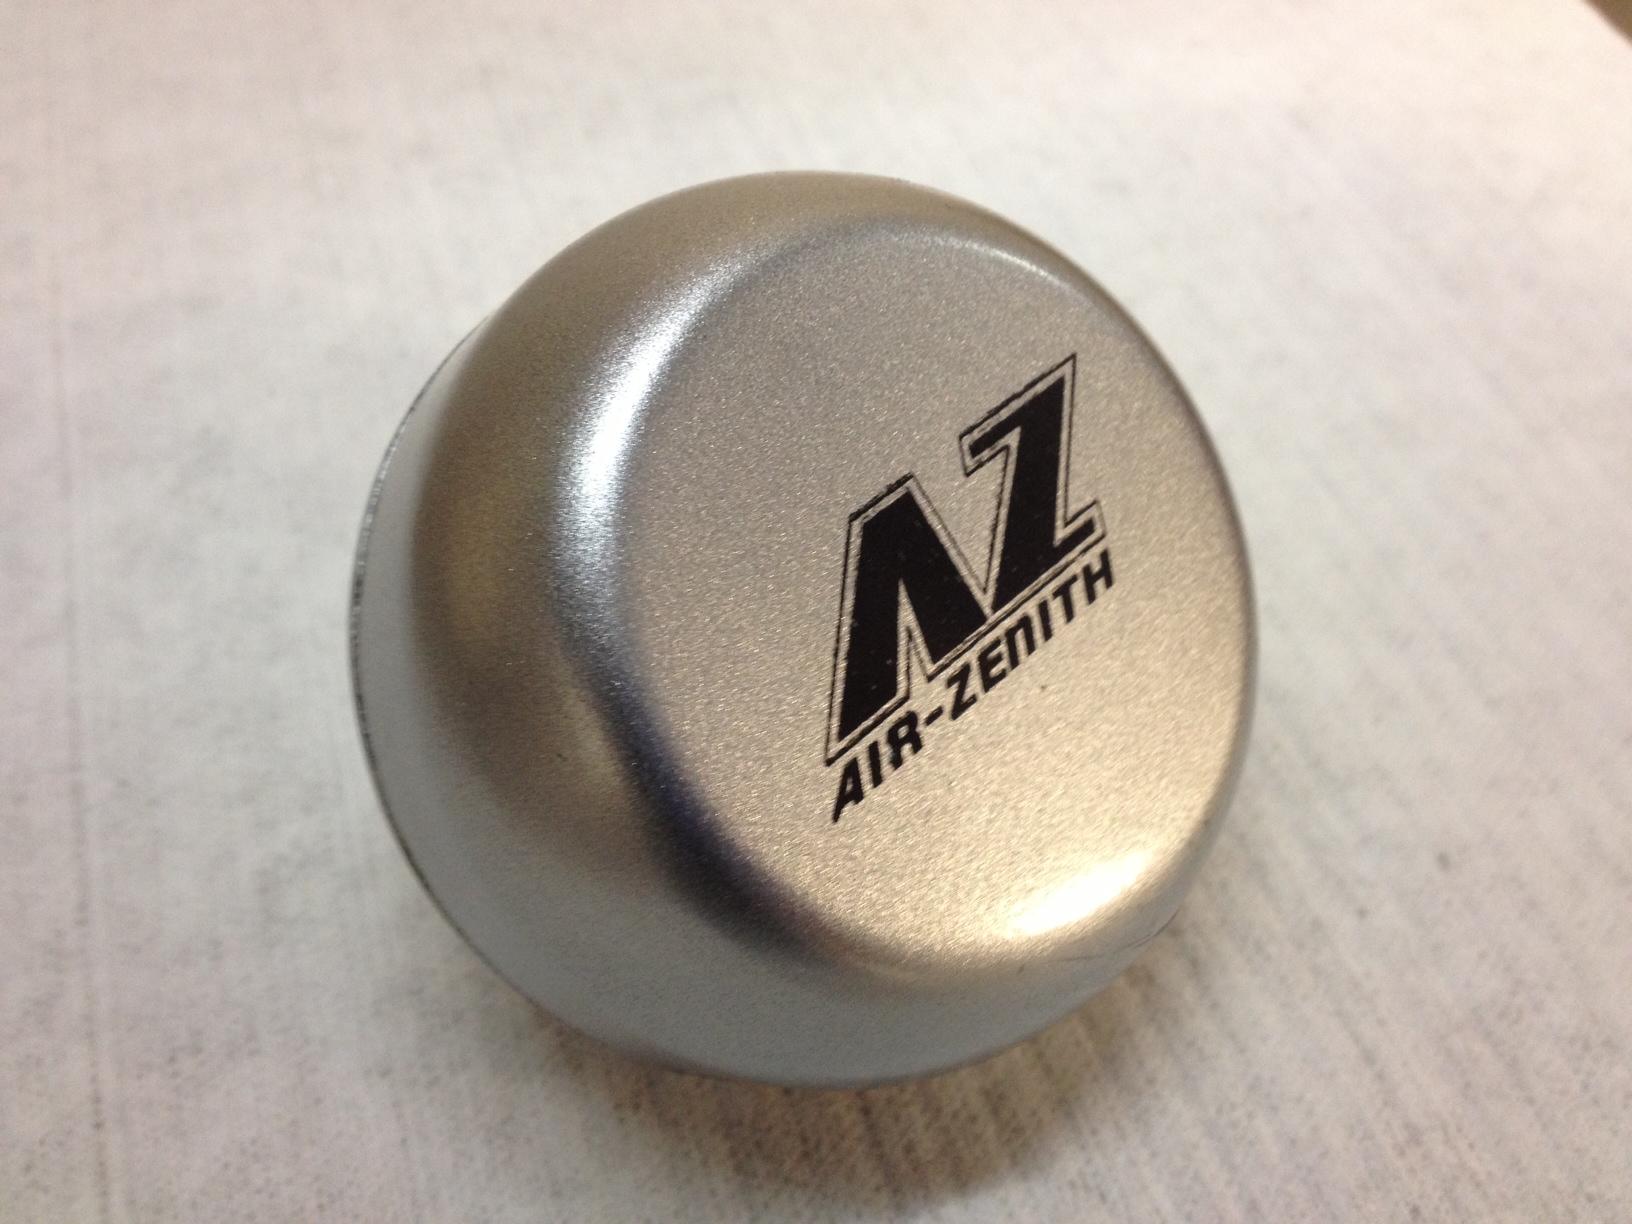 Air-Zenith Air filter